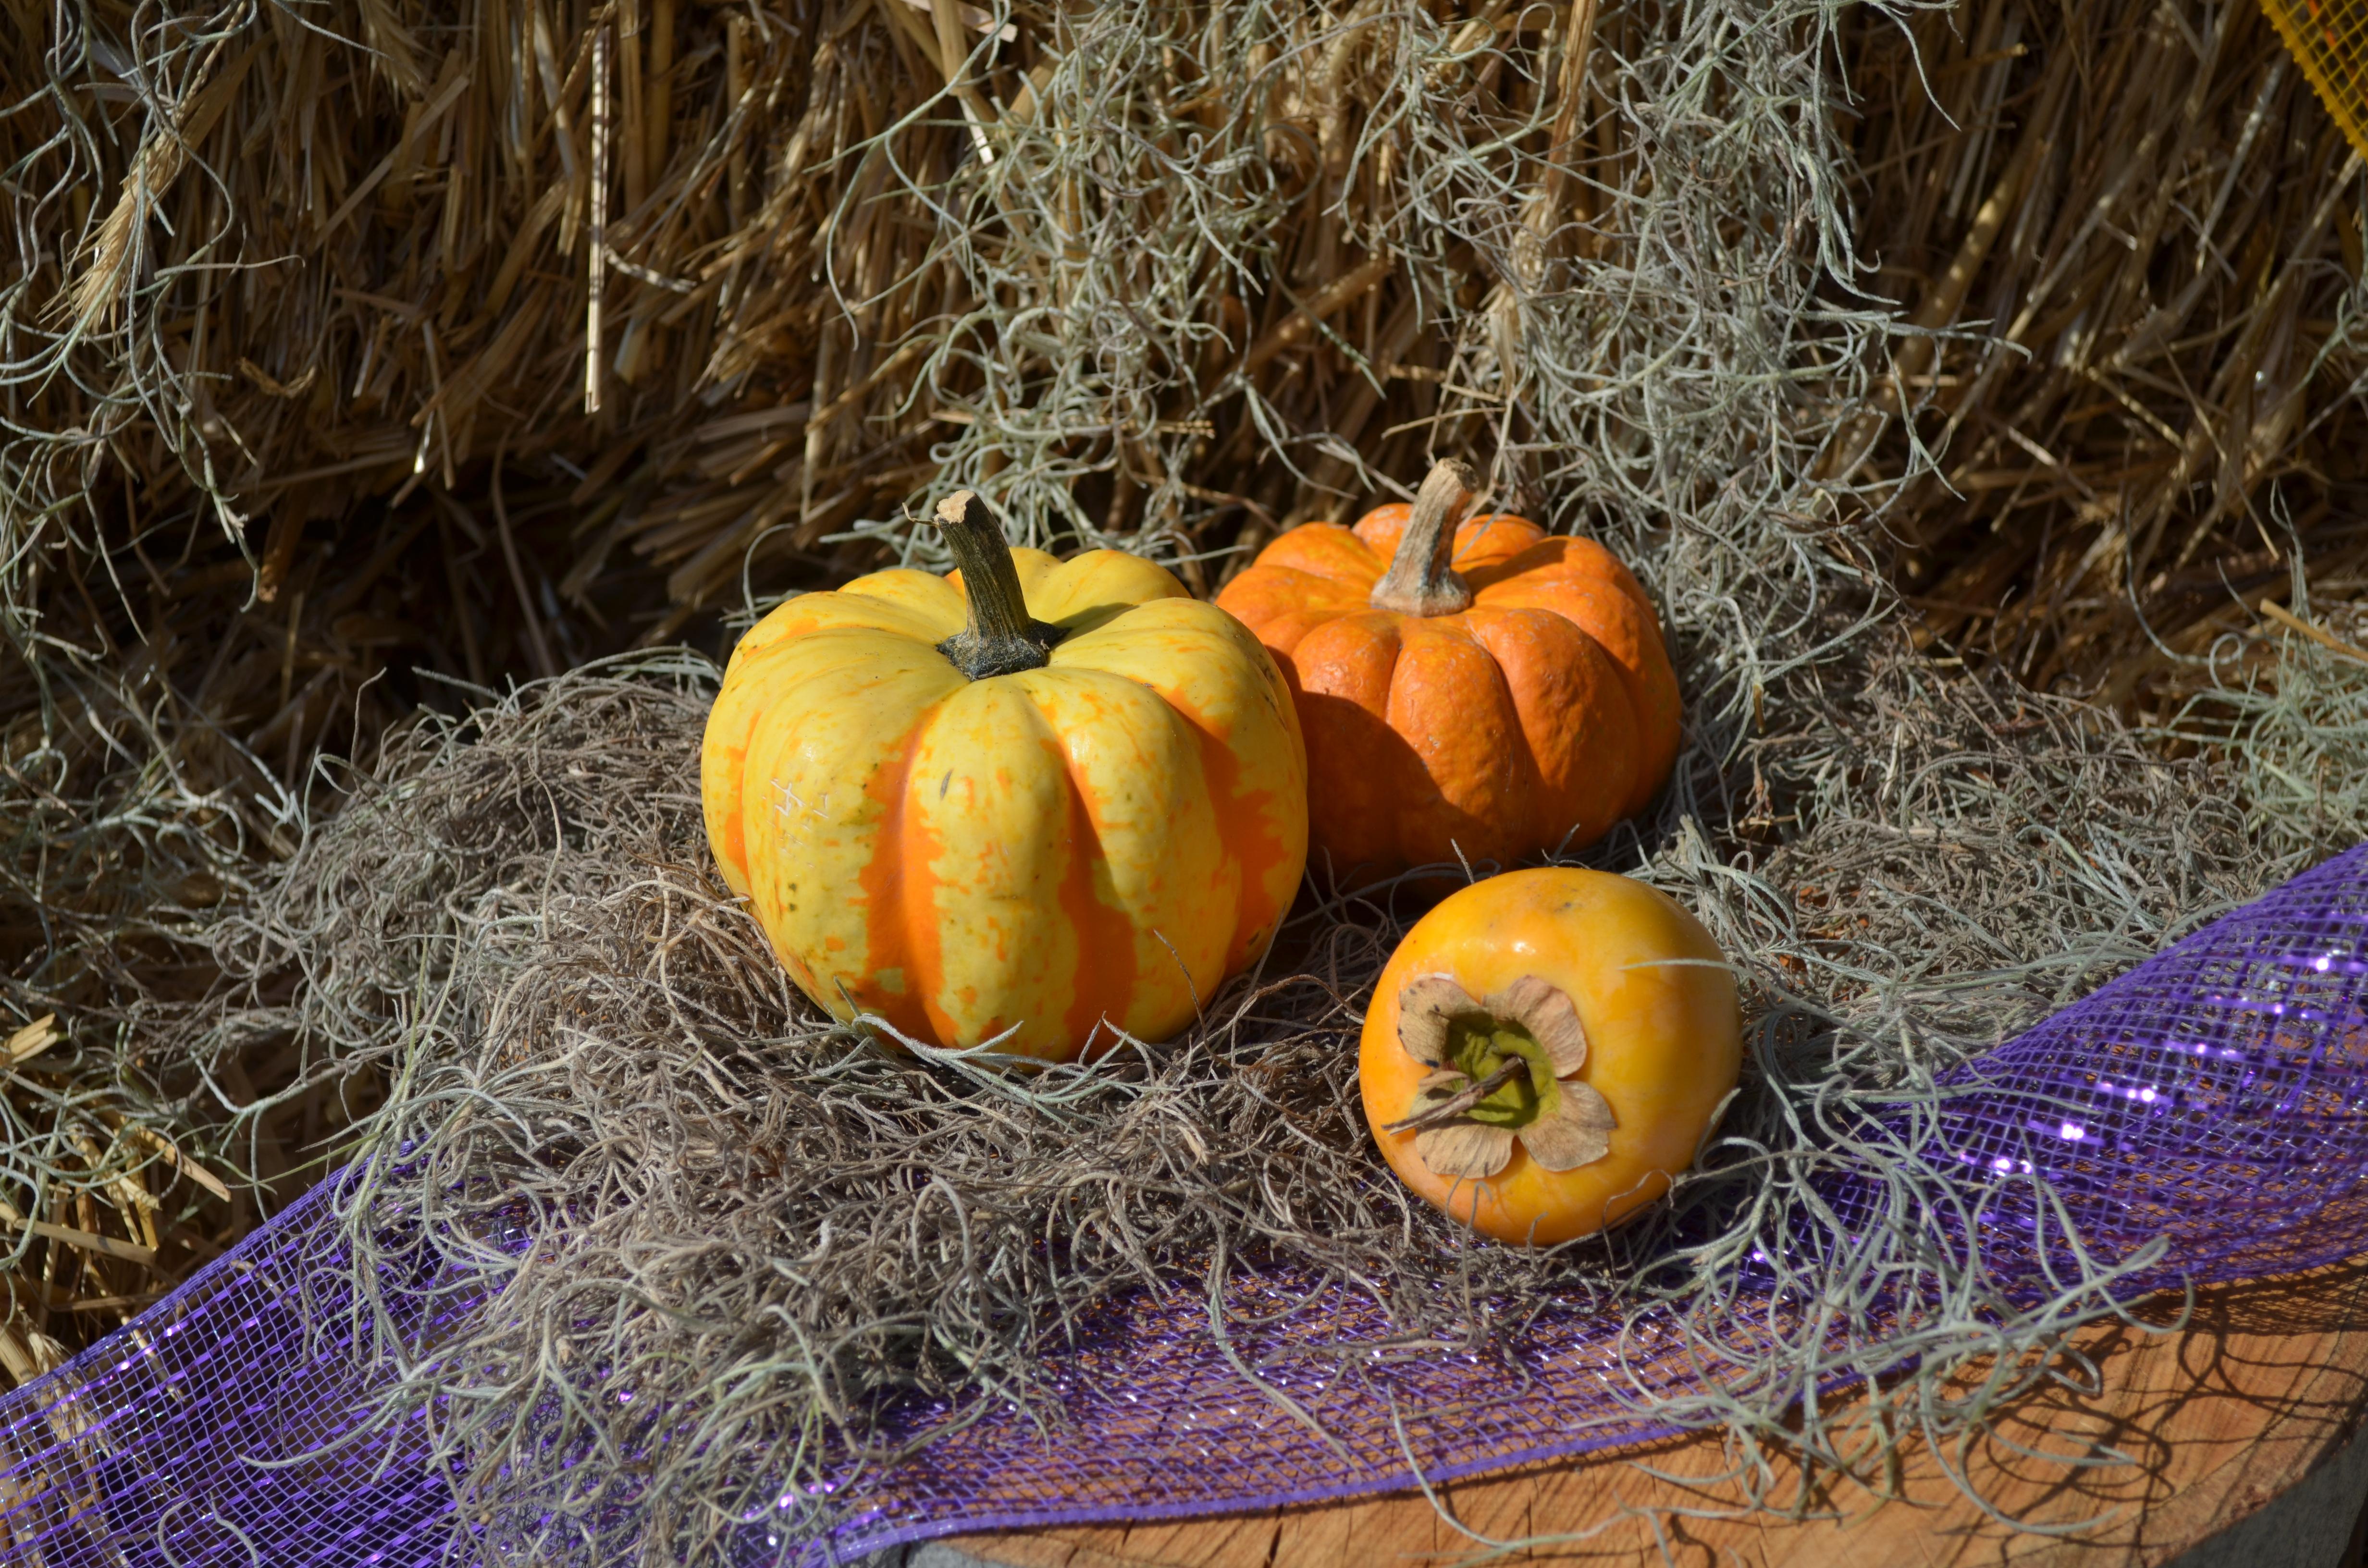 gourds Lewis Ginter Botanical Garden